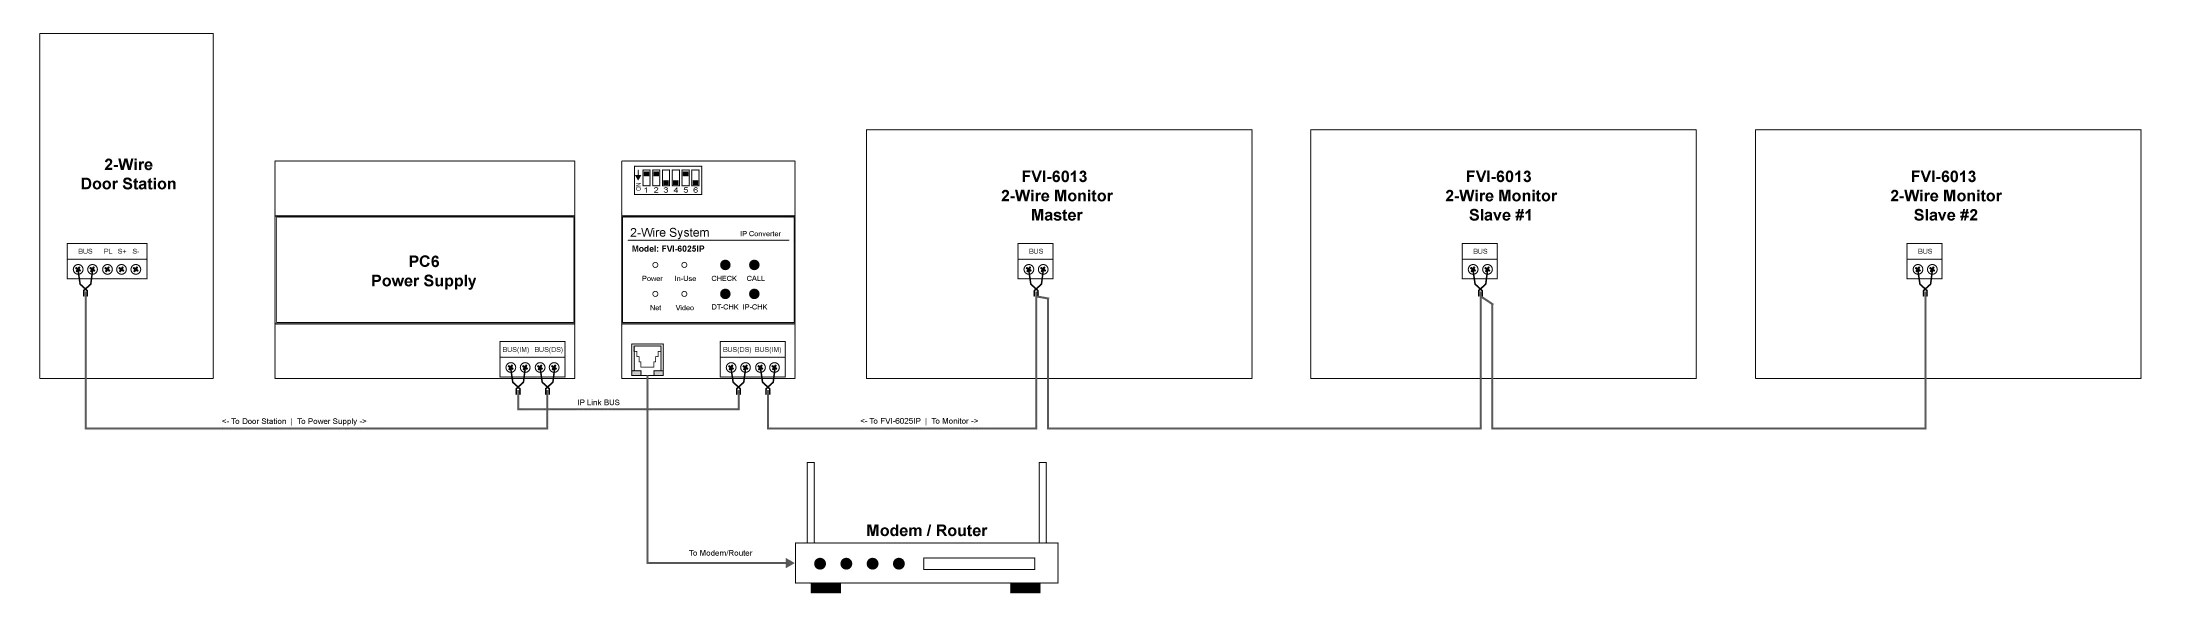 2 wire app instructions [ 2199 x 623 Pixel ]